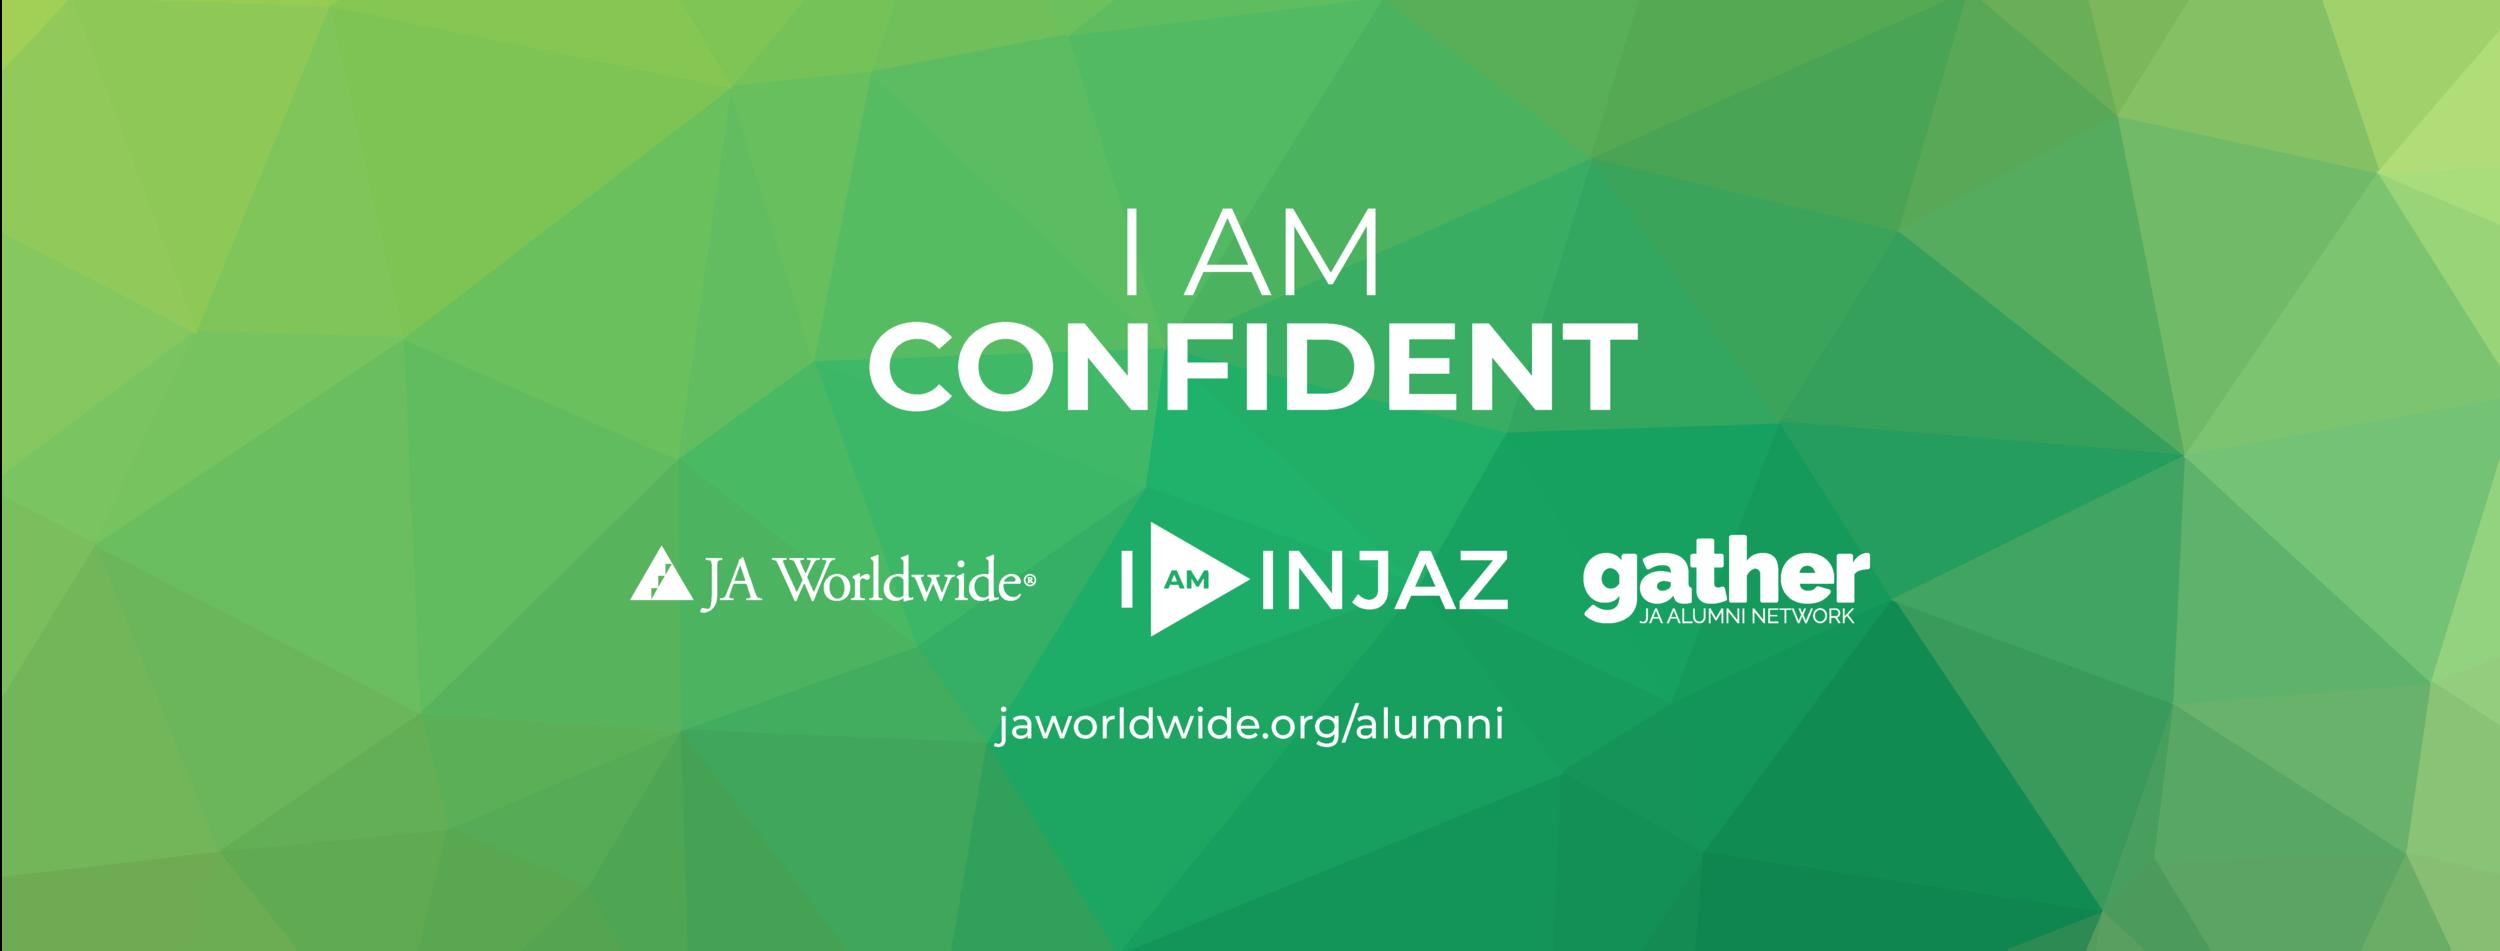 I am confident-I am INJAZ-Facebook banner.png